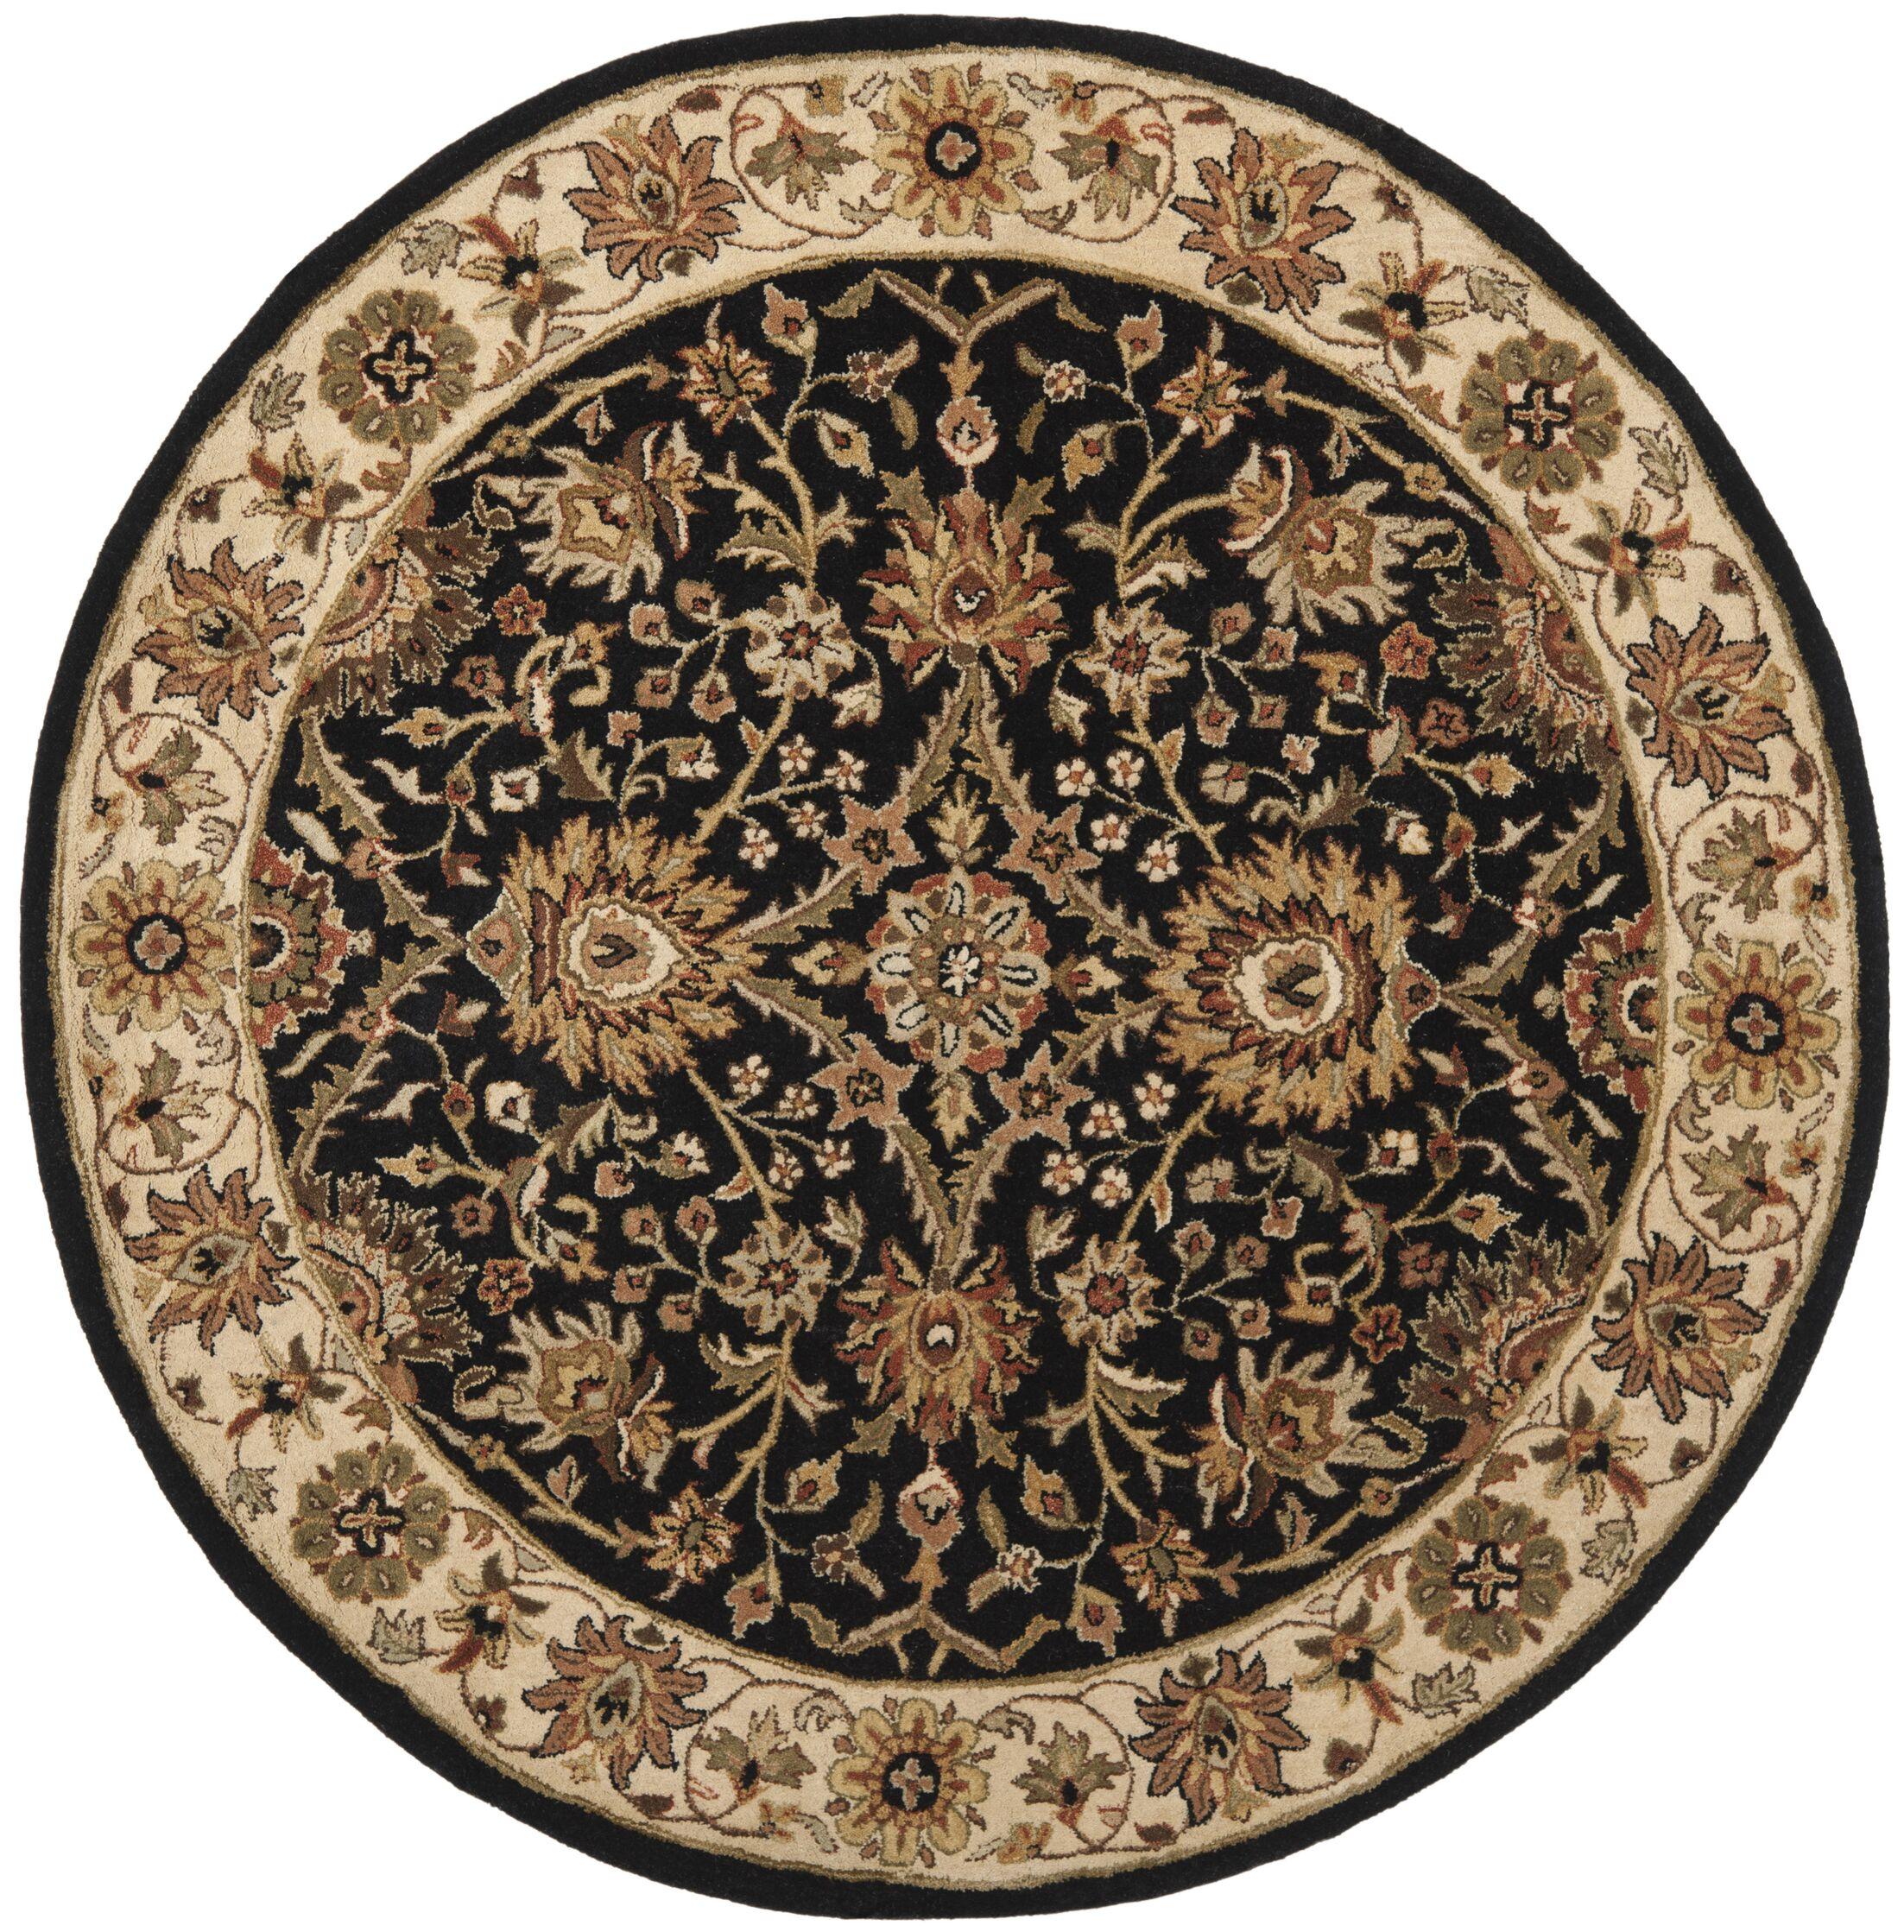 Dunbar Hand-Woven Wool Black Area Rug Rug Size: Round 6'